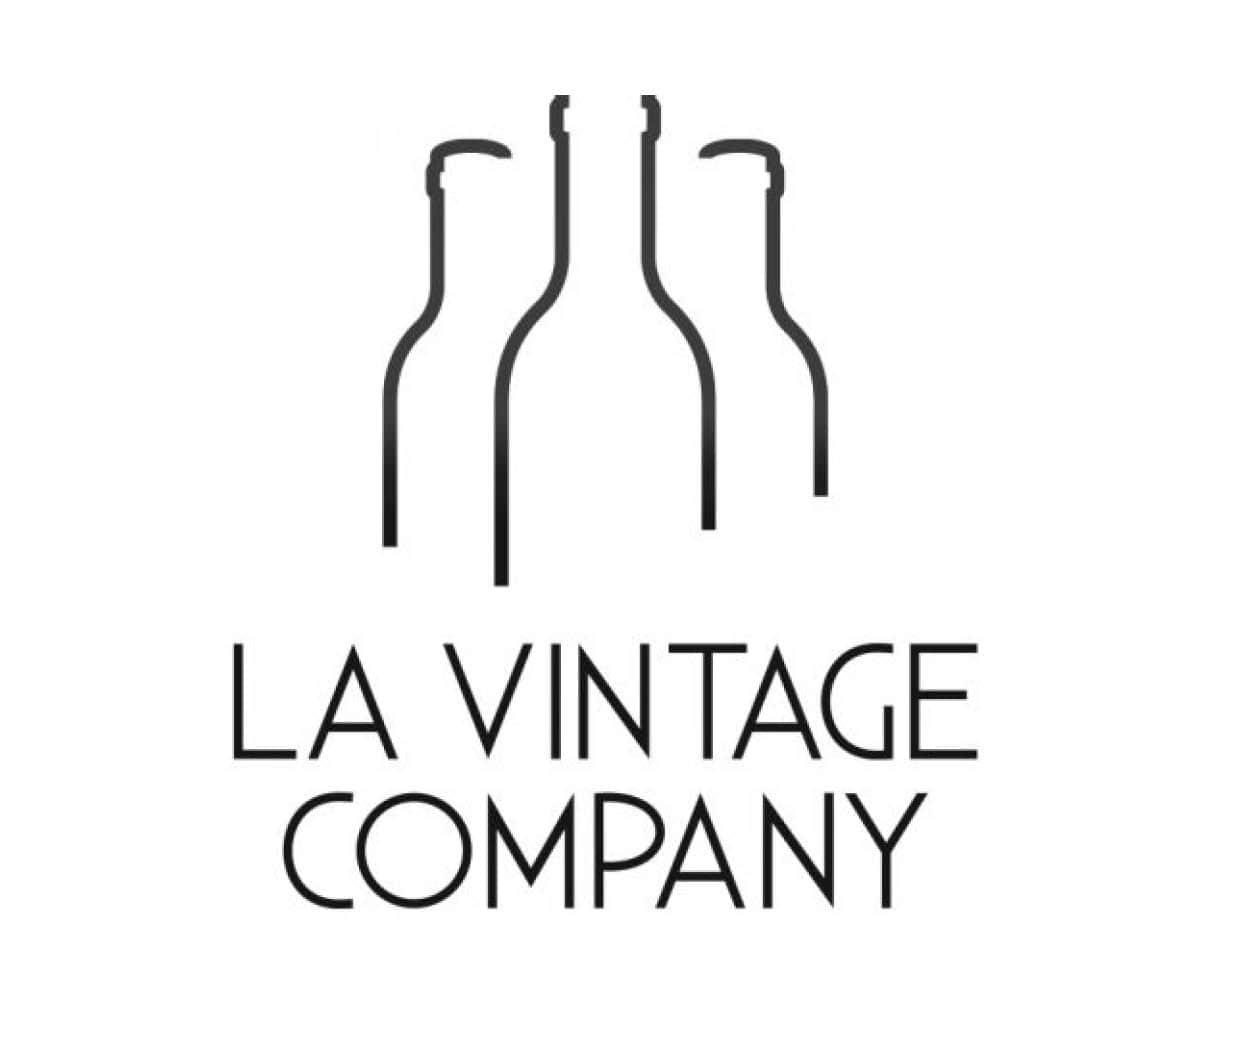 La Vintage Company